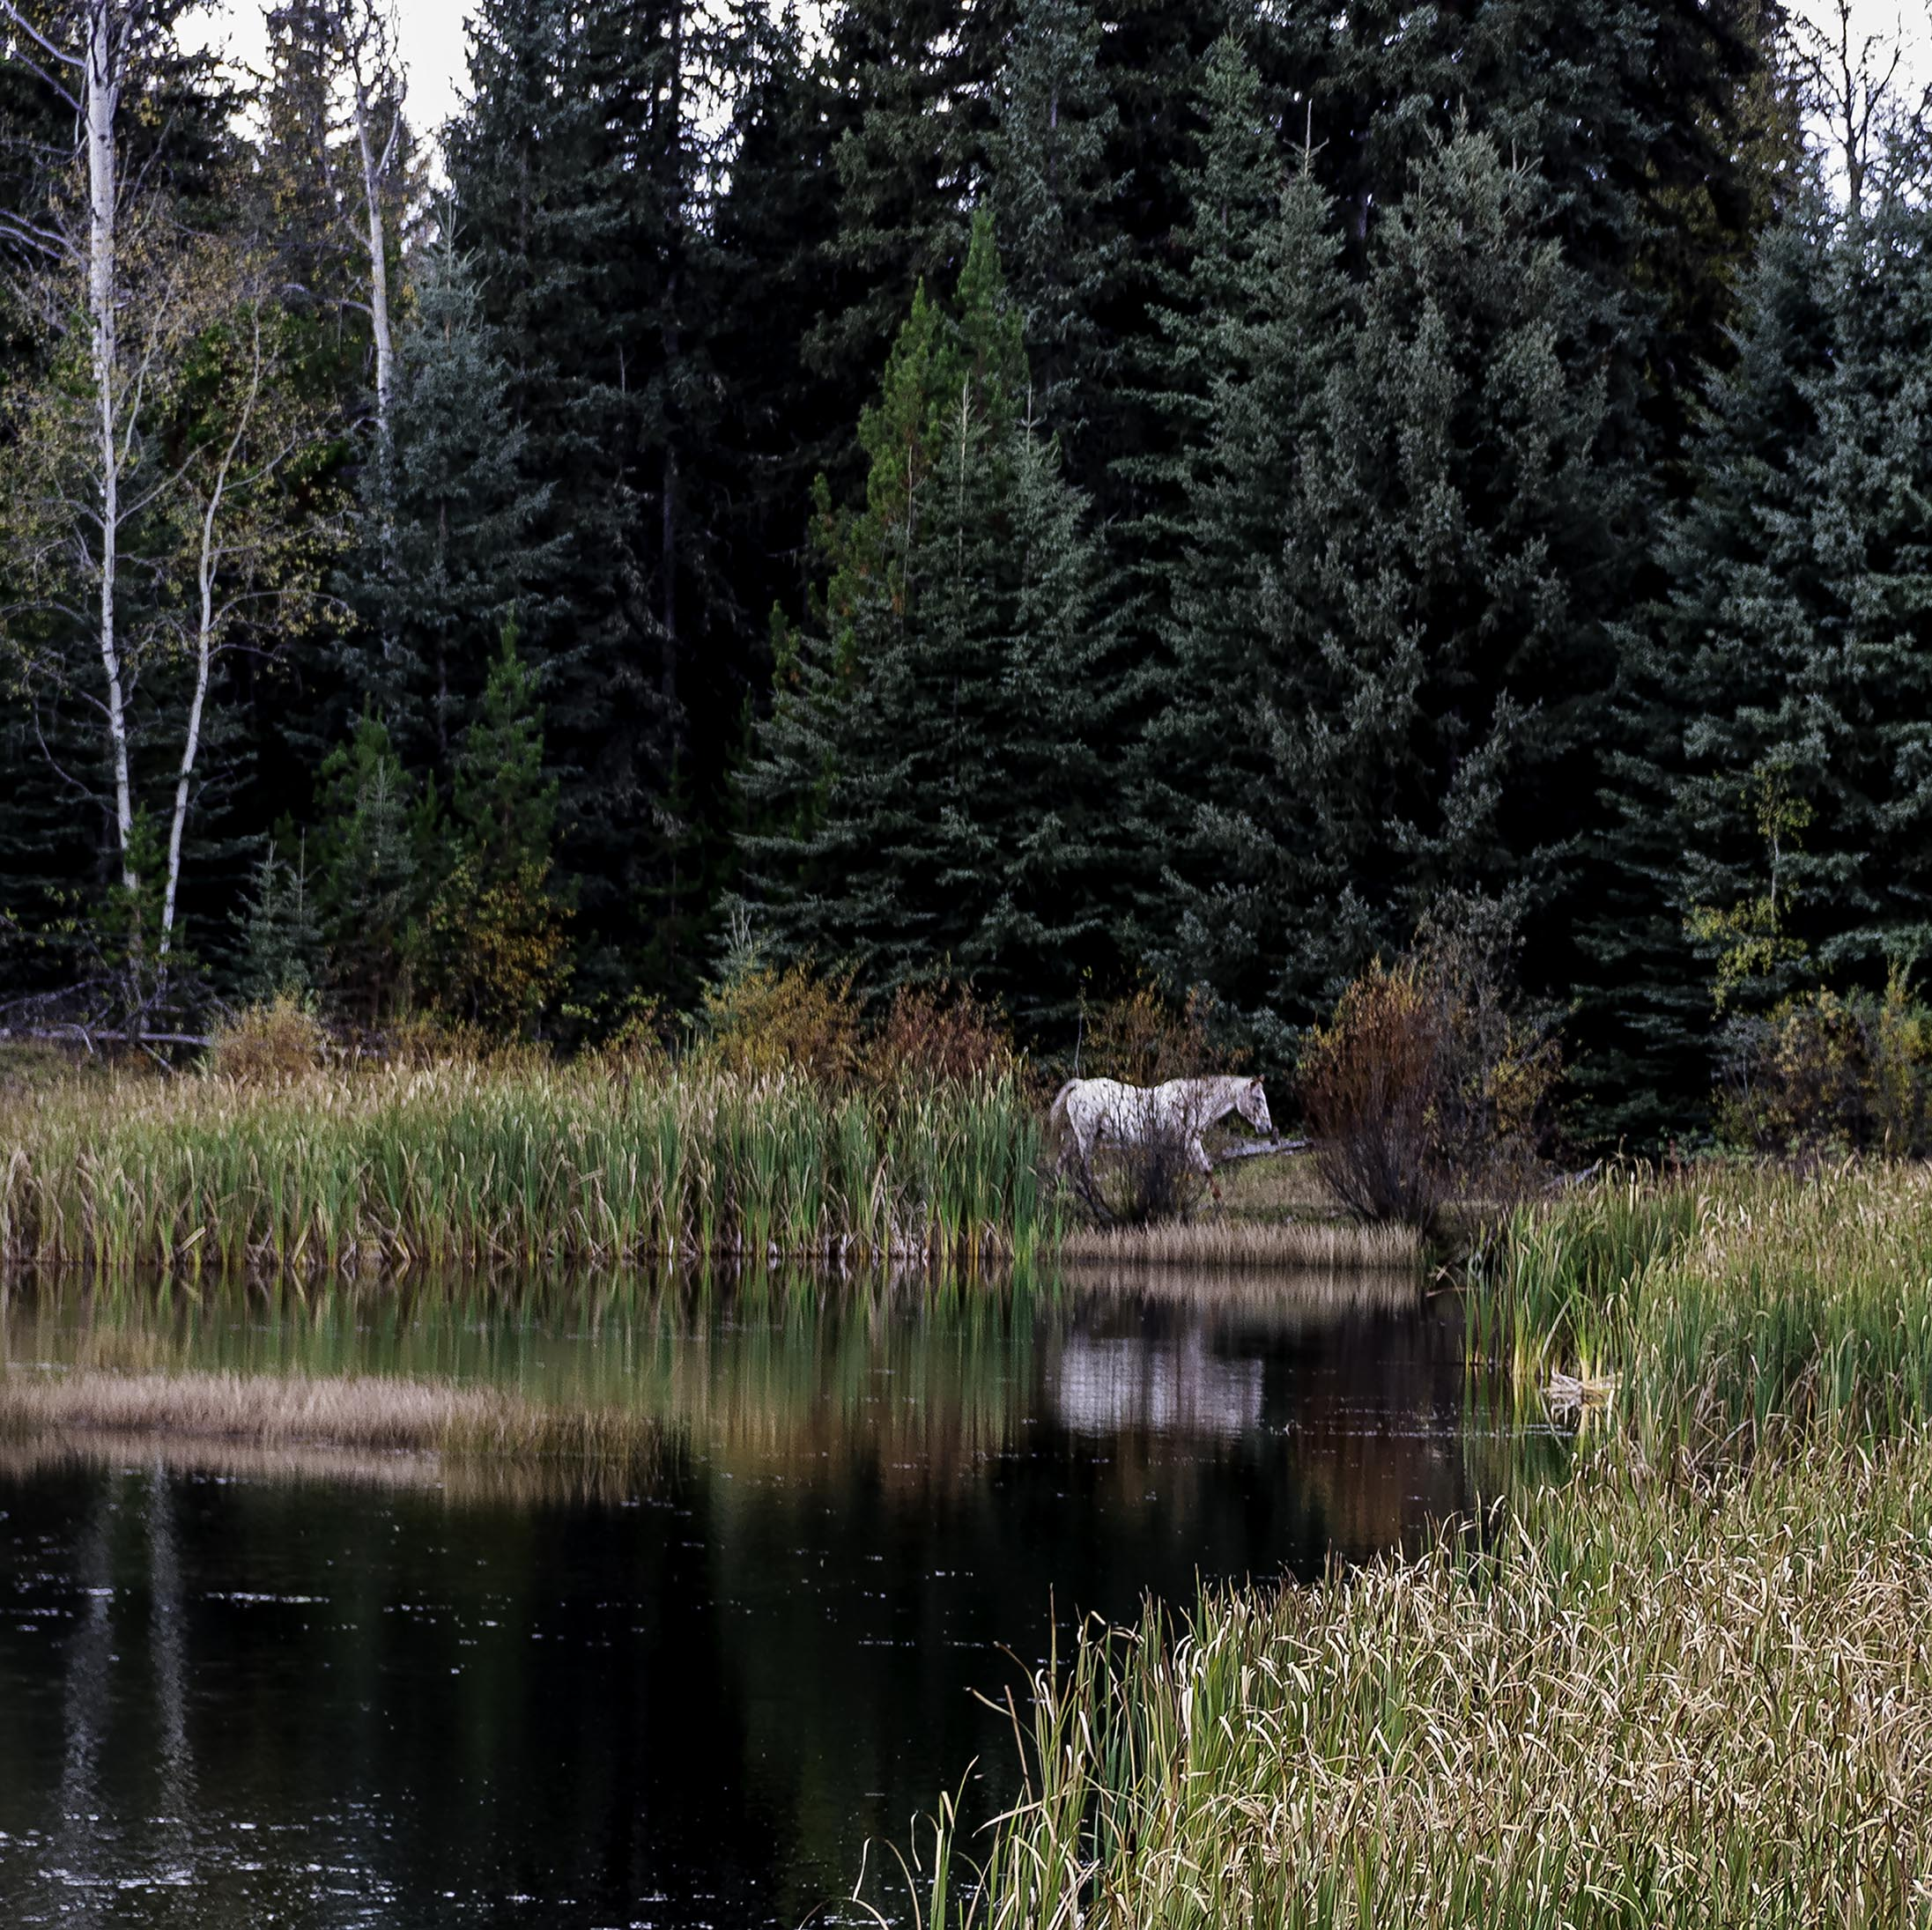 Horse at Wolf Valley Ranch - Gary Hardaker